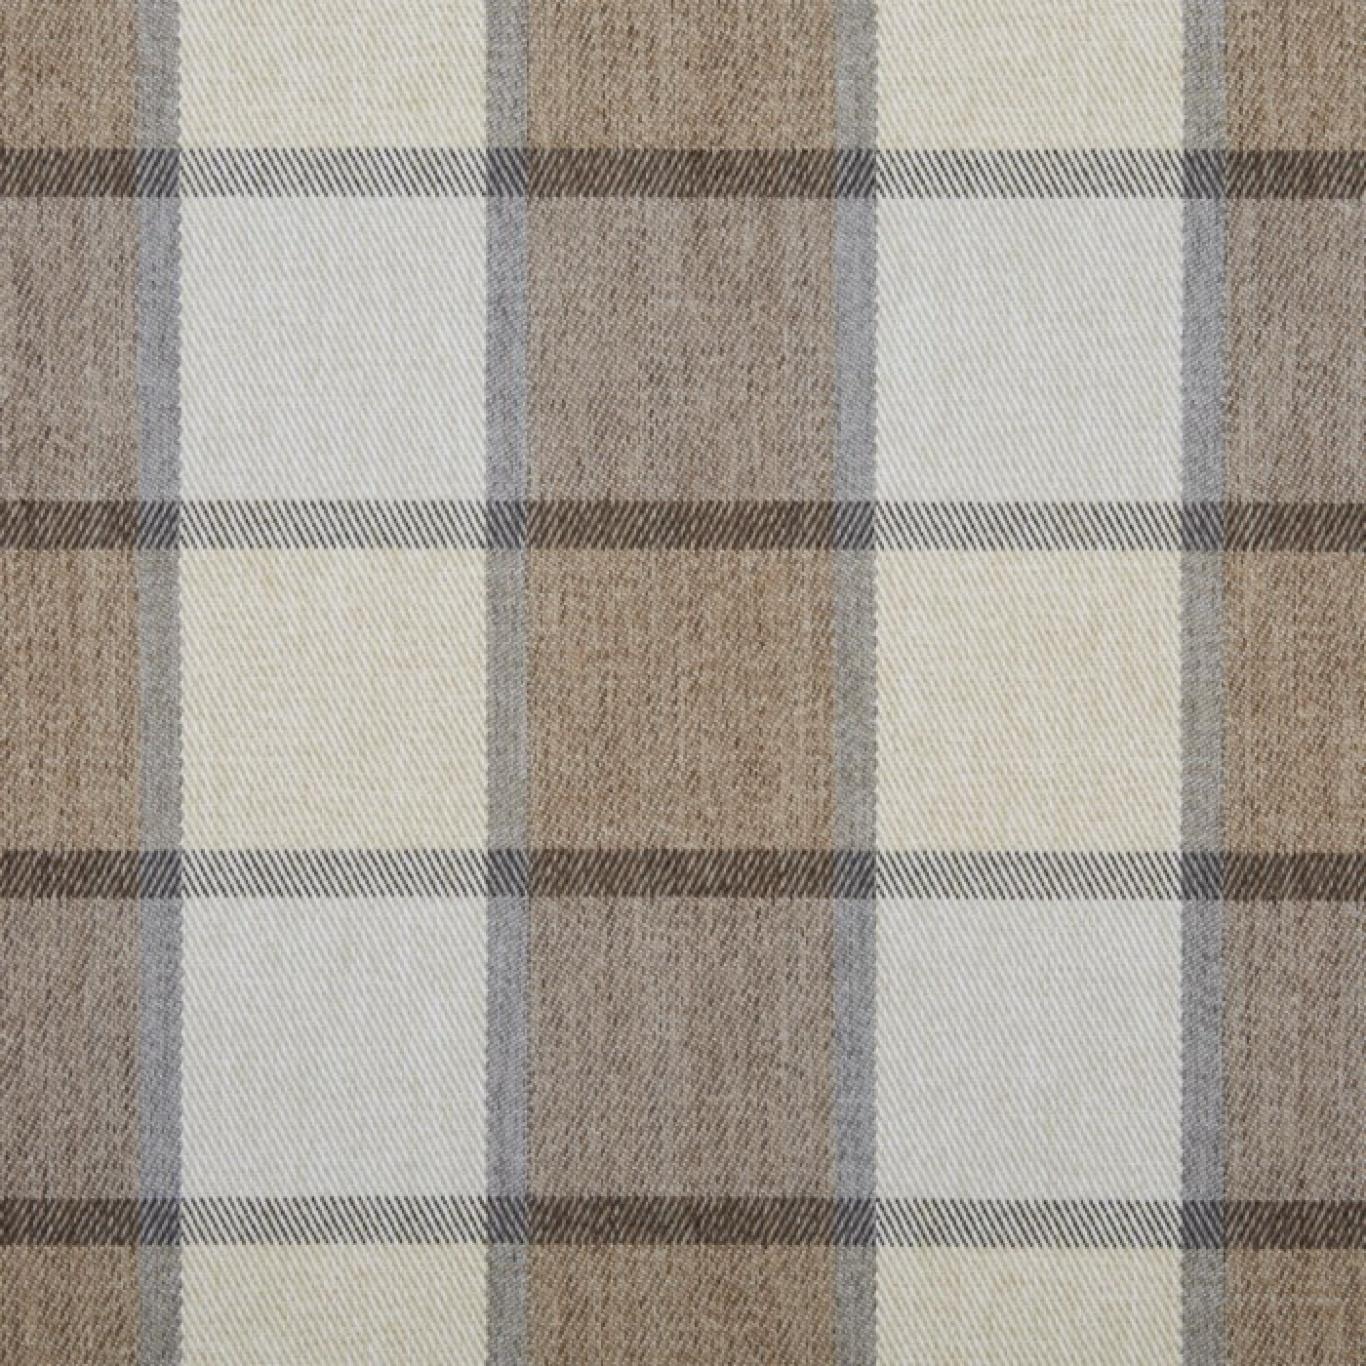 Image of Prestigious Solway Backen Fabric